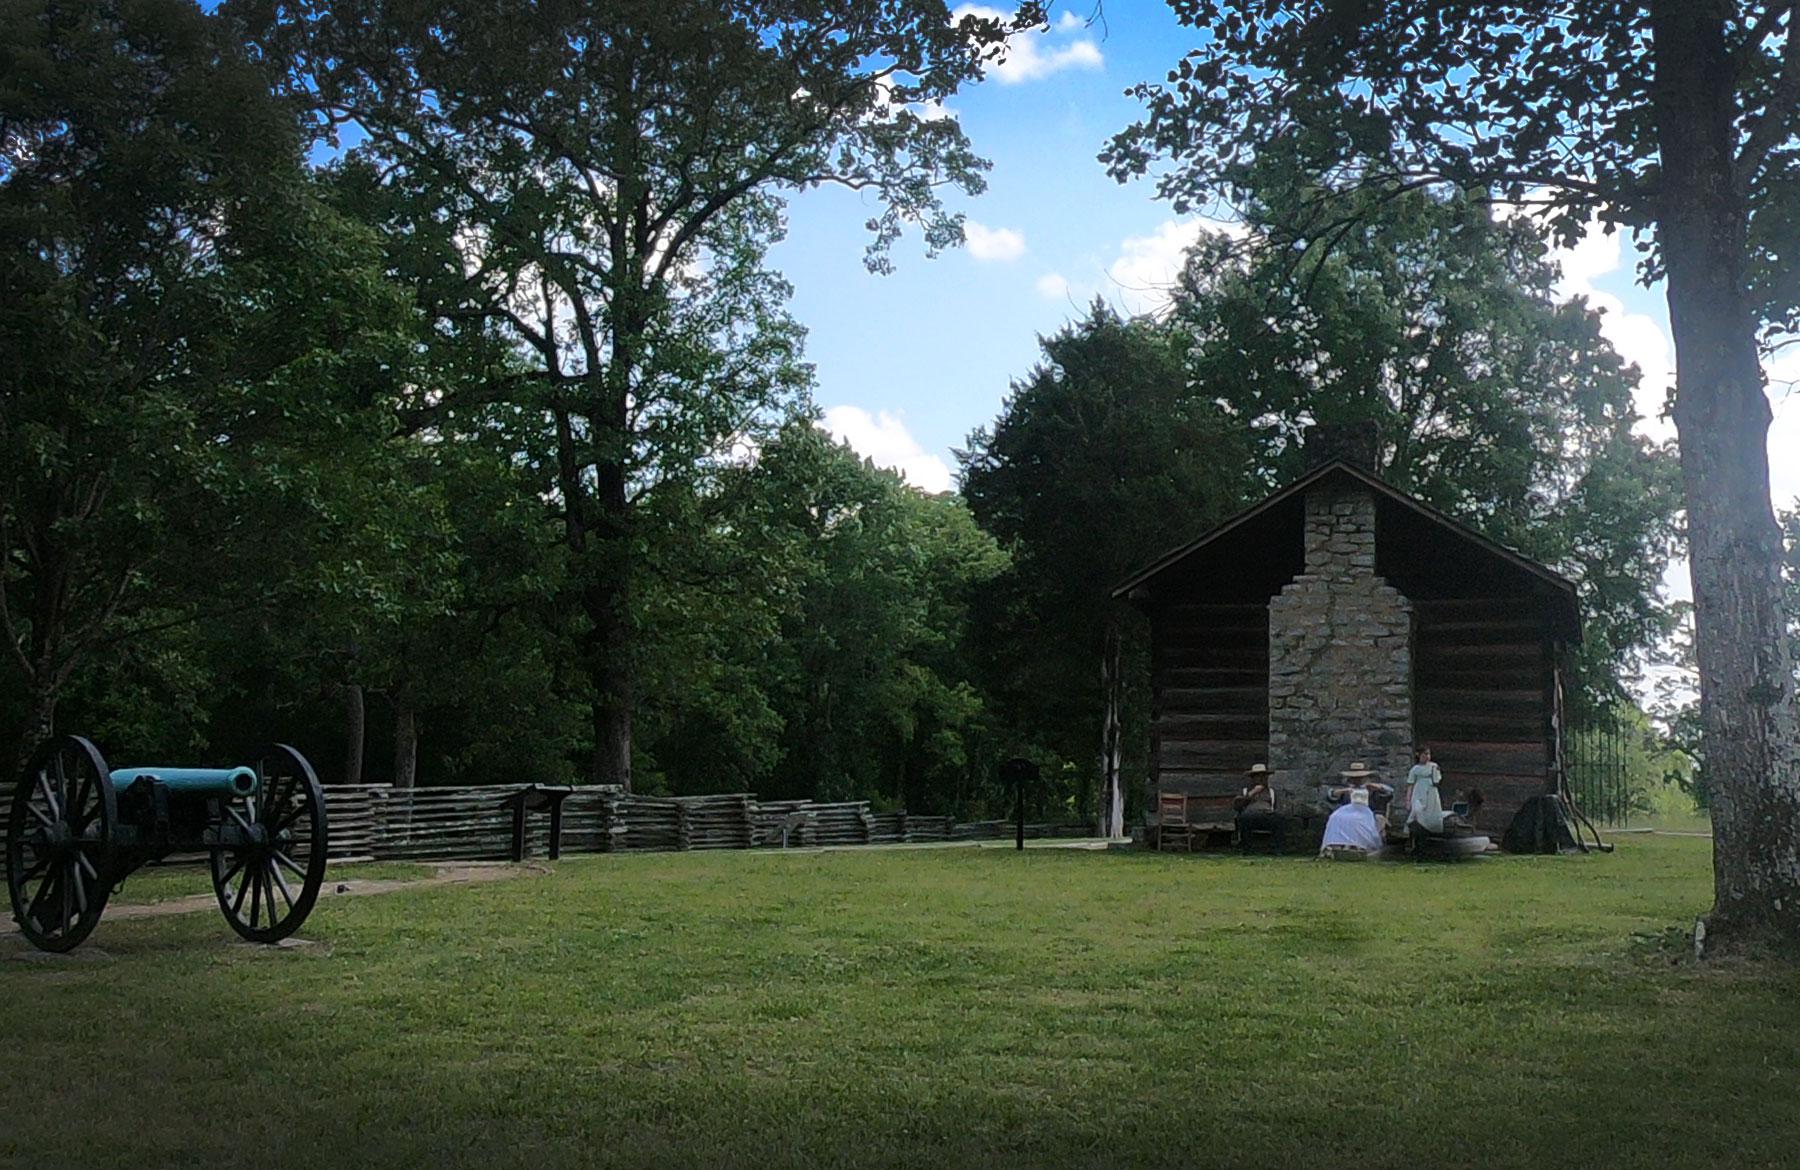 Living history program outside the Brotherton Cabin at Monument at Chickamauga Battlefield National Military Park, Georgia